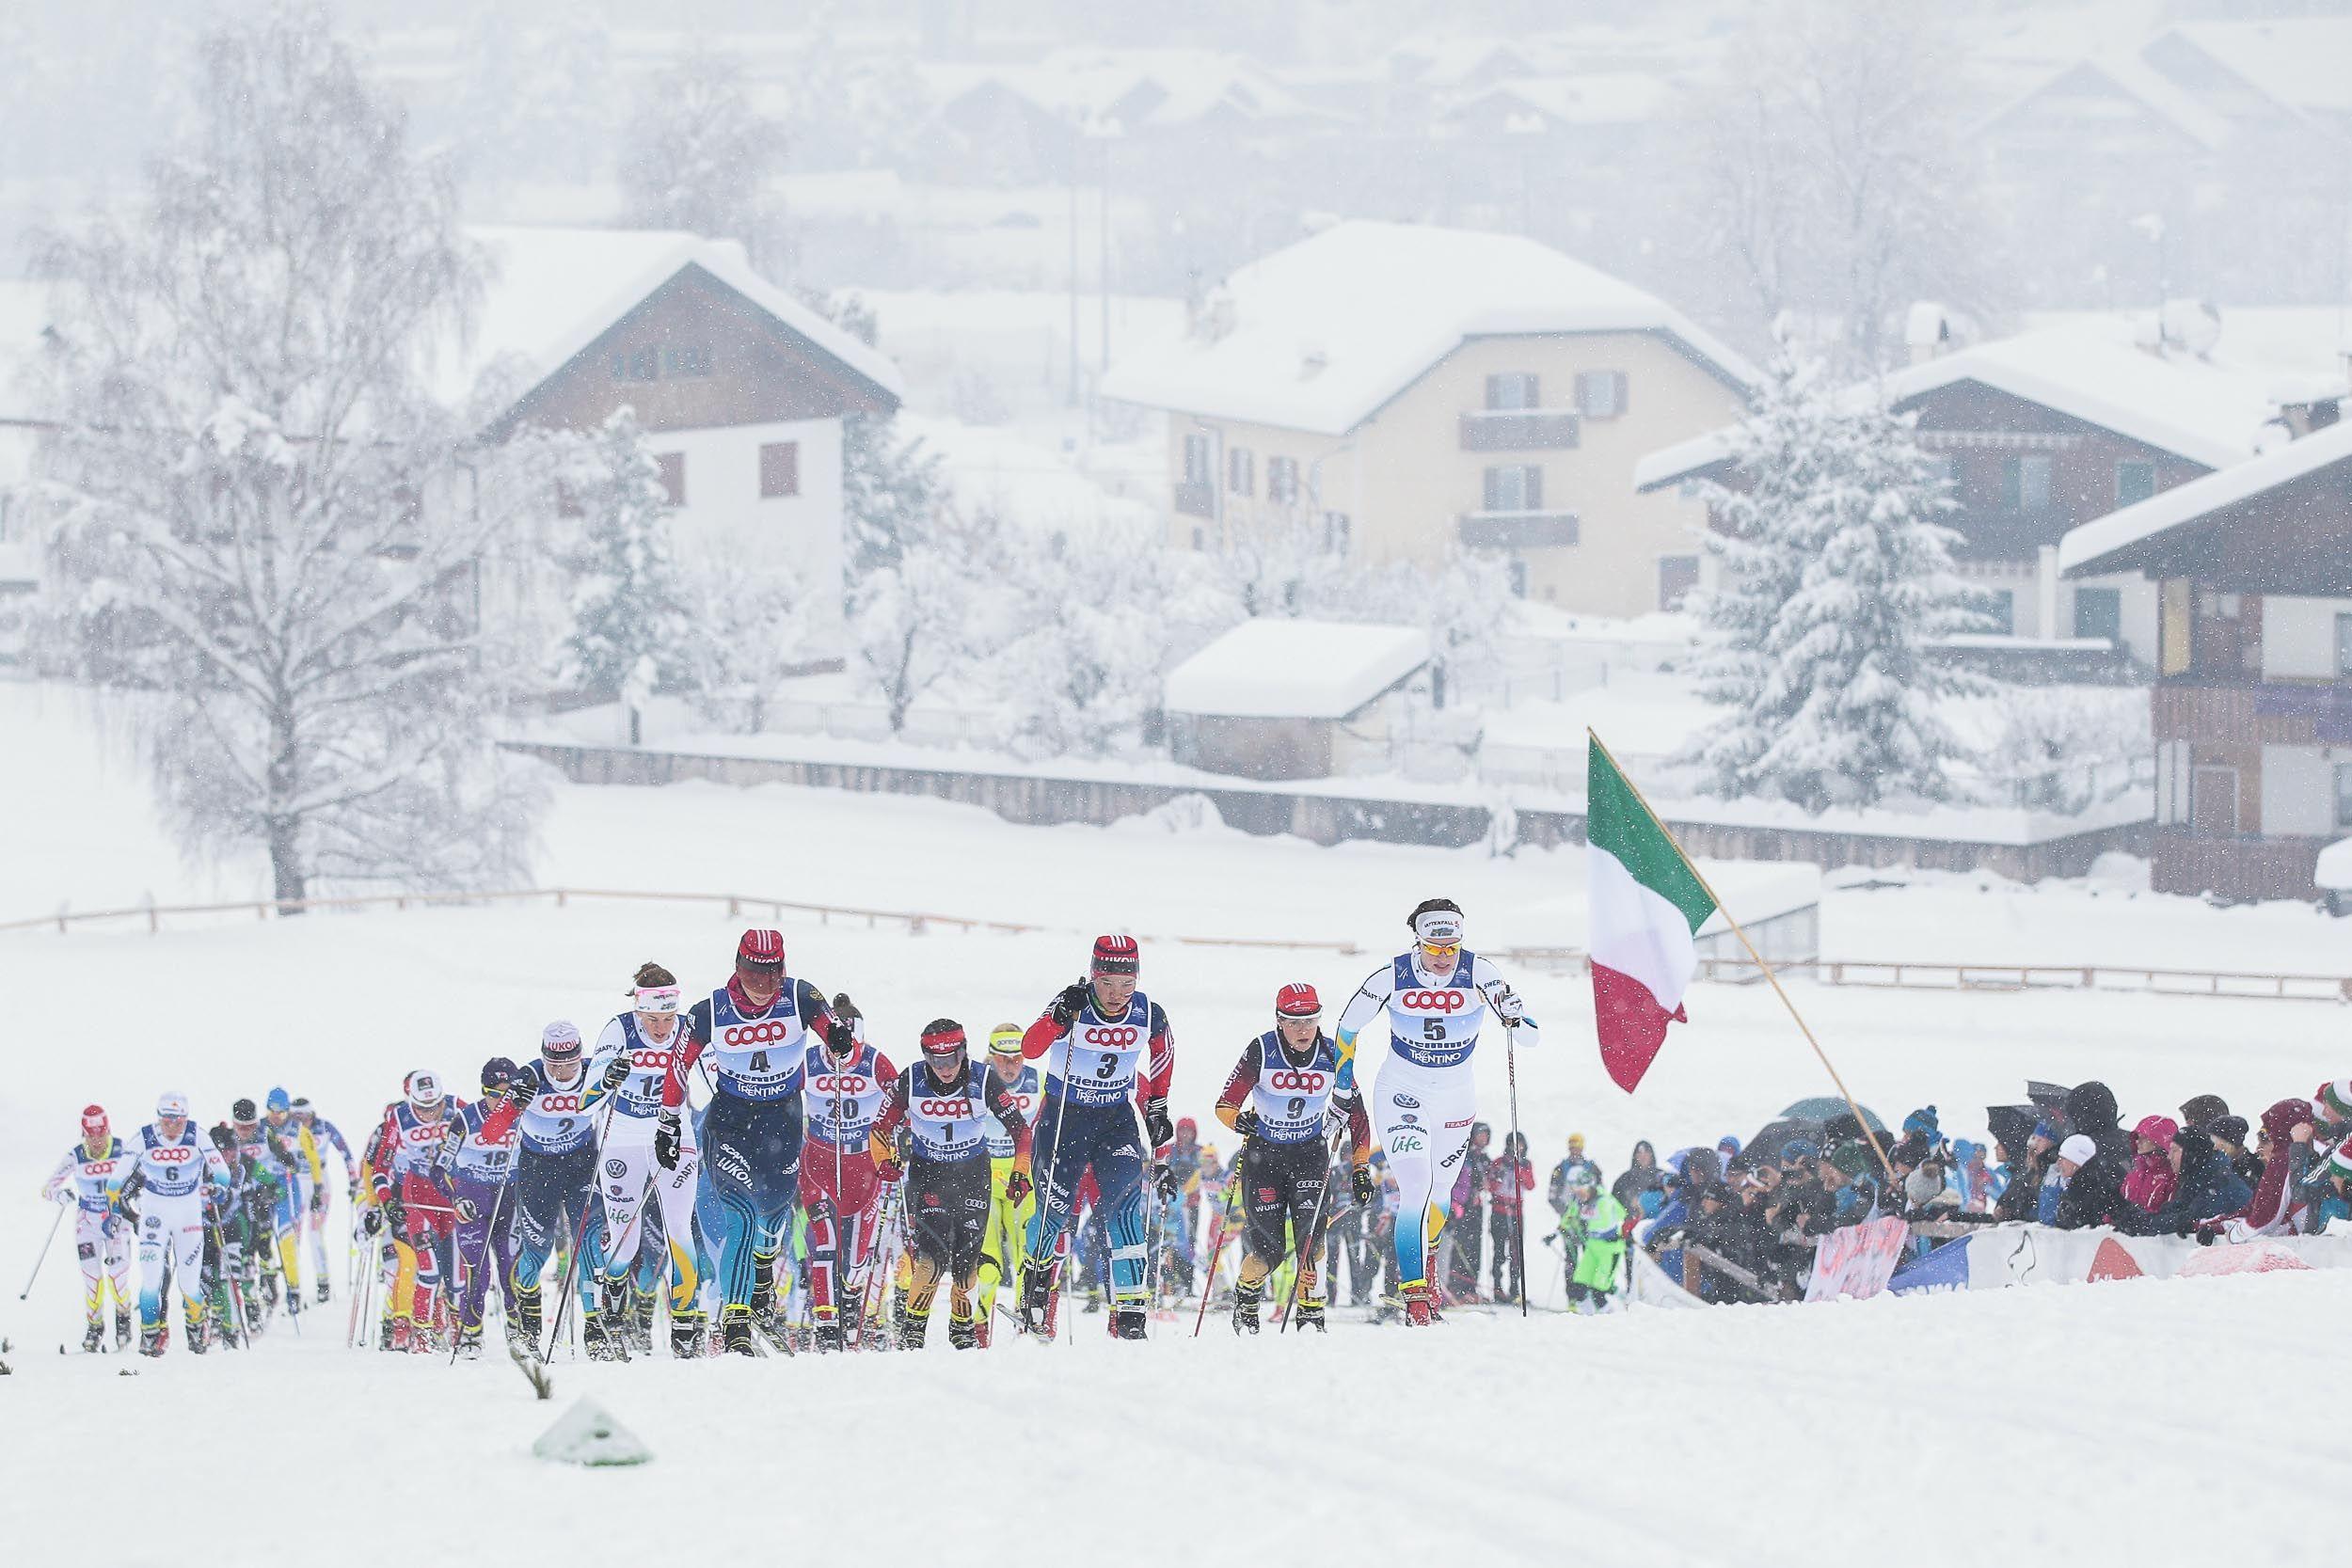 Ladies Junior Skiathlon 5 km C + 5 km F #Fiemme2014 #NordicSki #Skiathlon #SkiRelay #Sci #SkiJumping #NordicCombined #XCSkiing #SciNordico #SaltoSci #CombinataNordica #ValdiFiemme #Trentino #Sport #SportInvernali #WinterSports